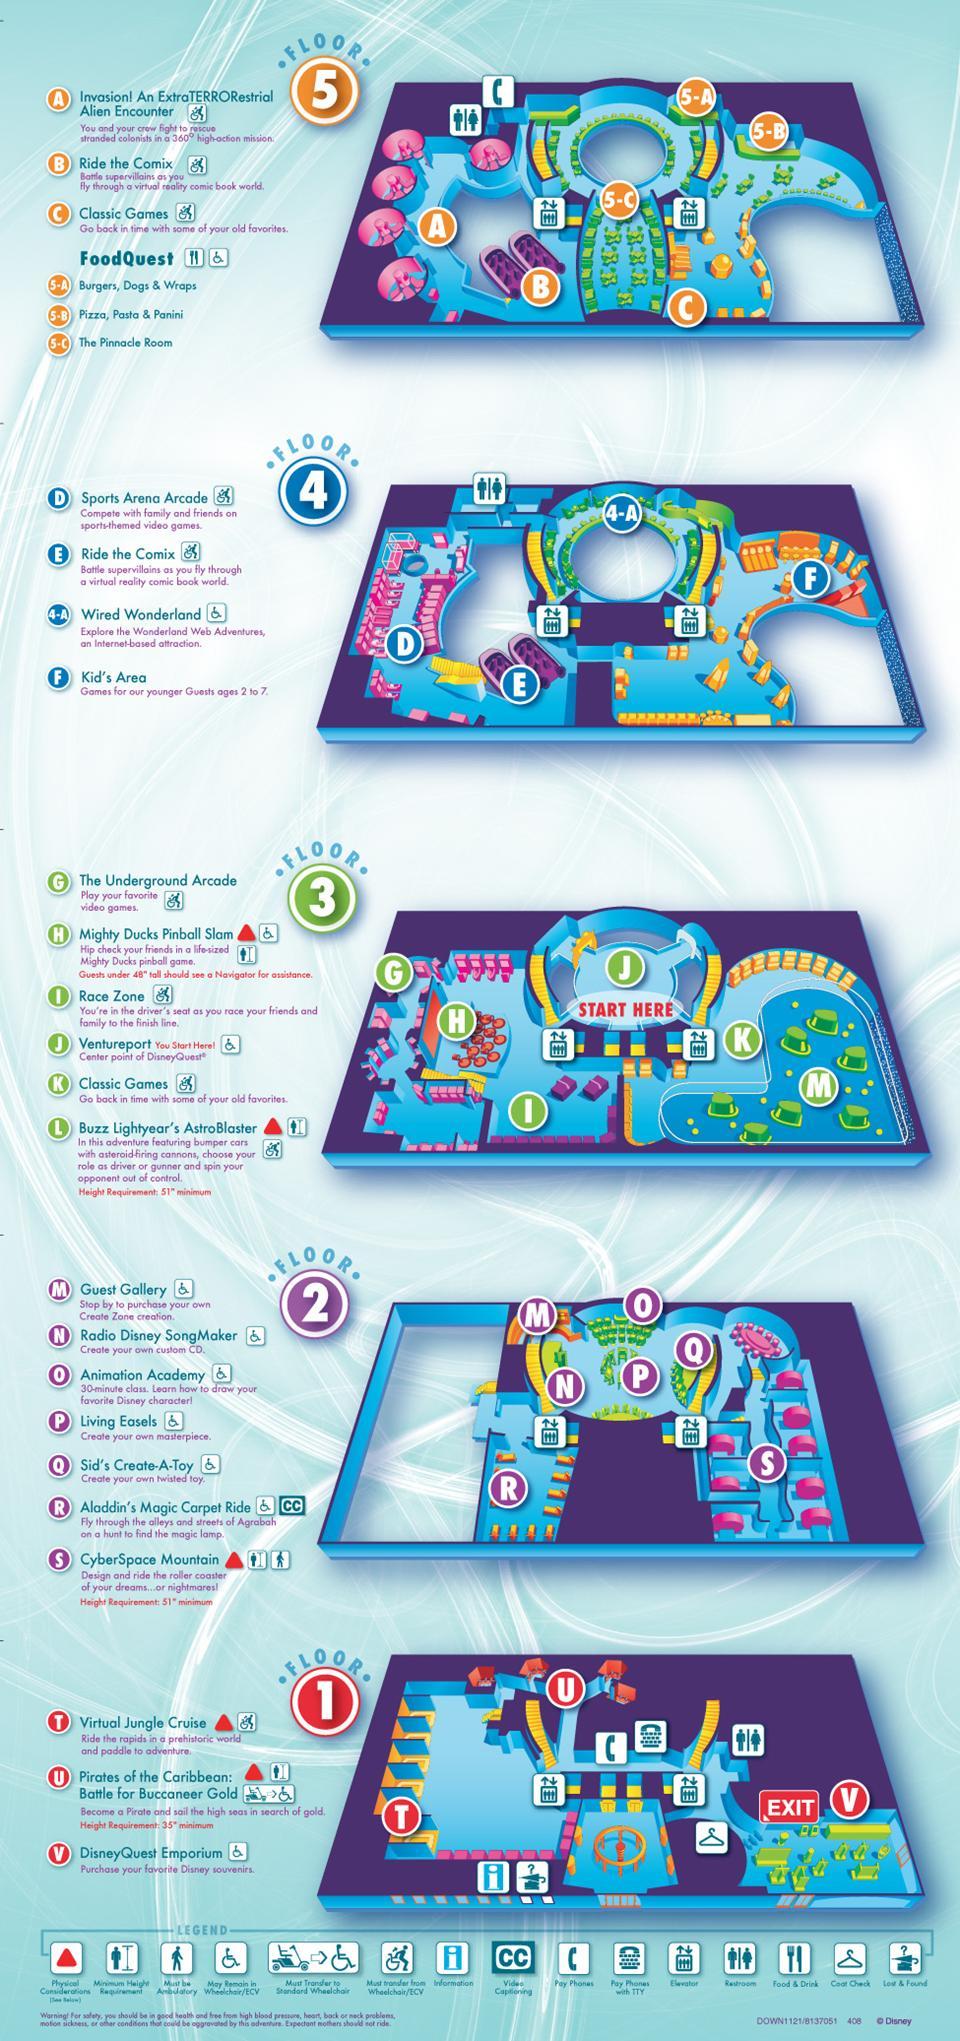 Disney Quest map  Photo 1 of 1